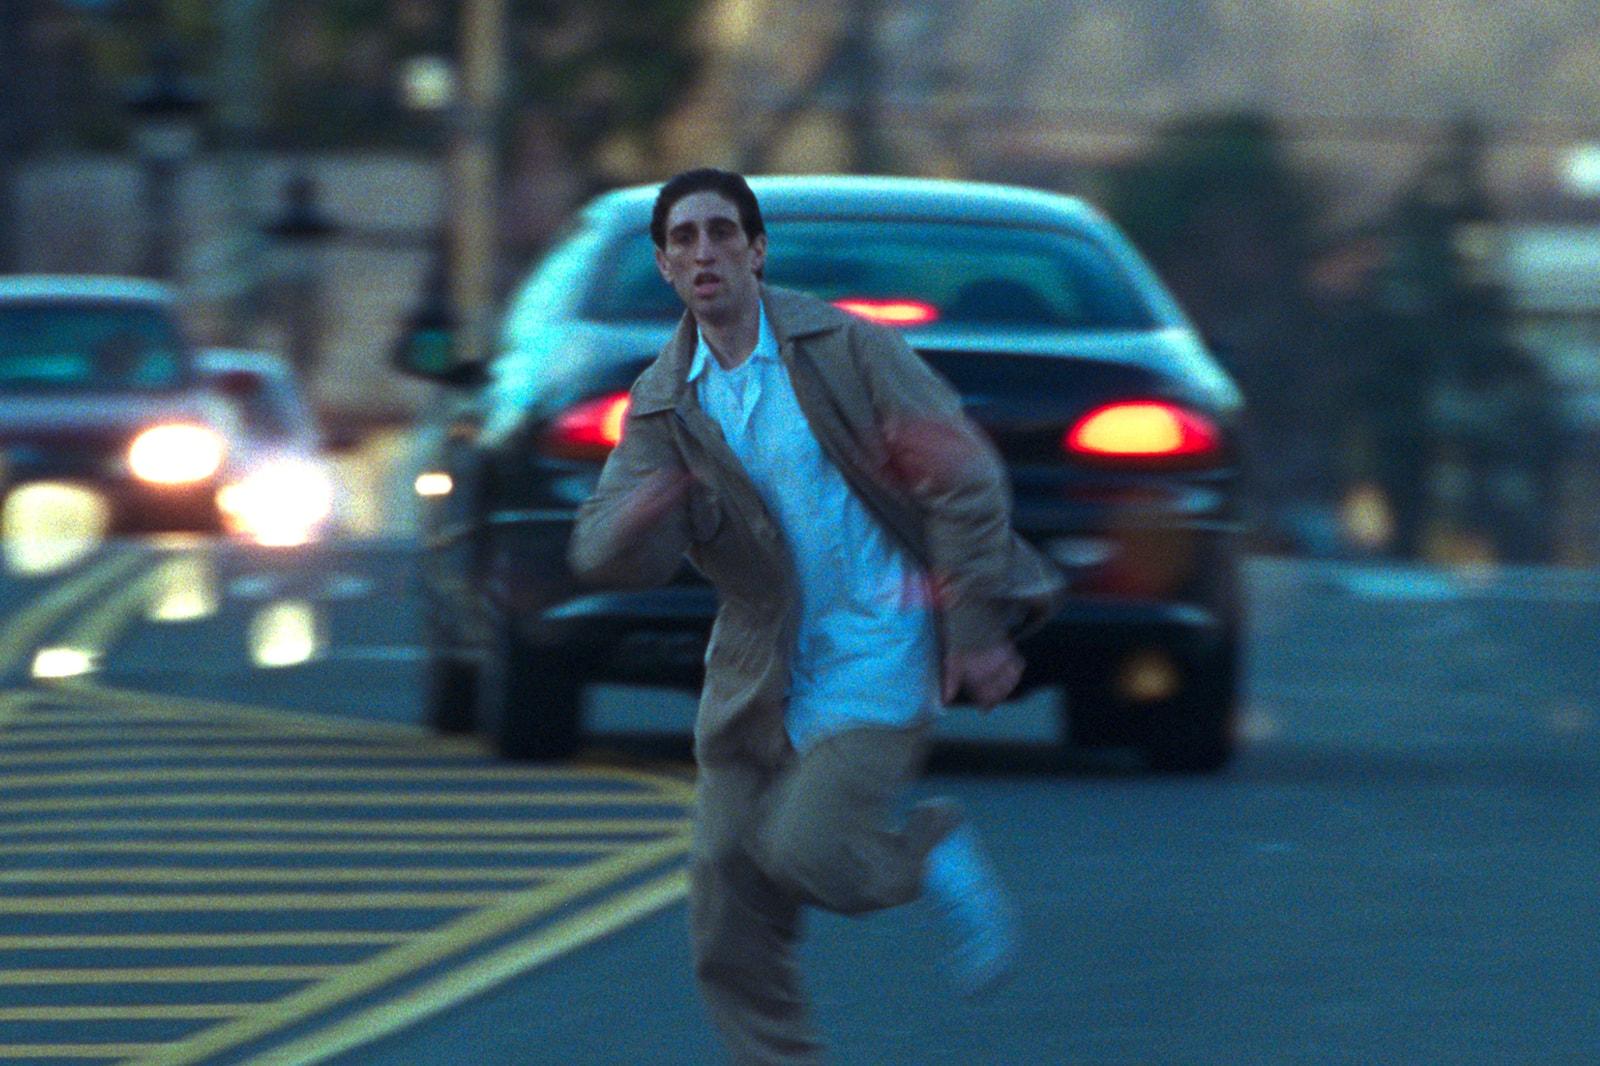 Good Time Safdie Brothers Movie A24 Robert Pattinson Buddy Duress Barkhad Abdi Taliah Webster Aaron Bondaroff Know Wave New York City Film